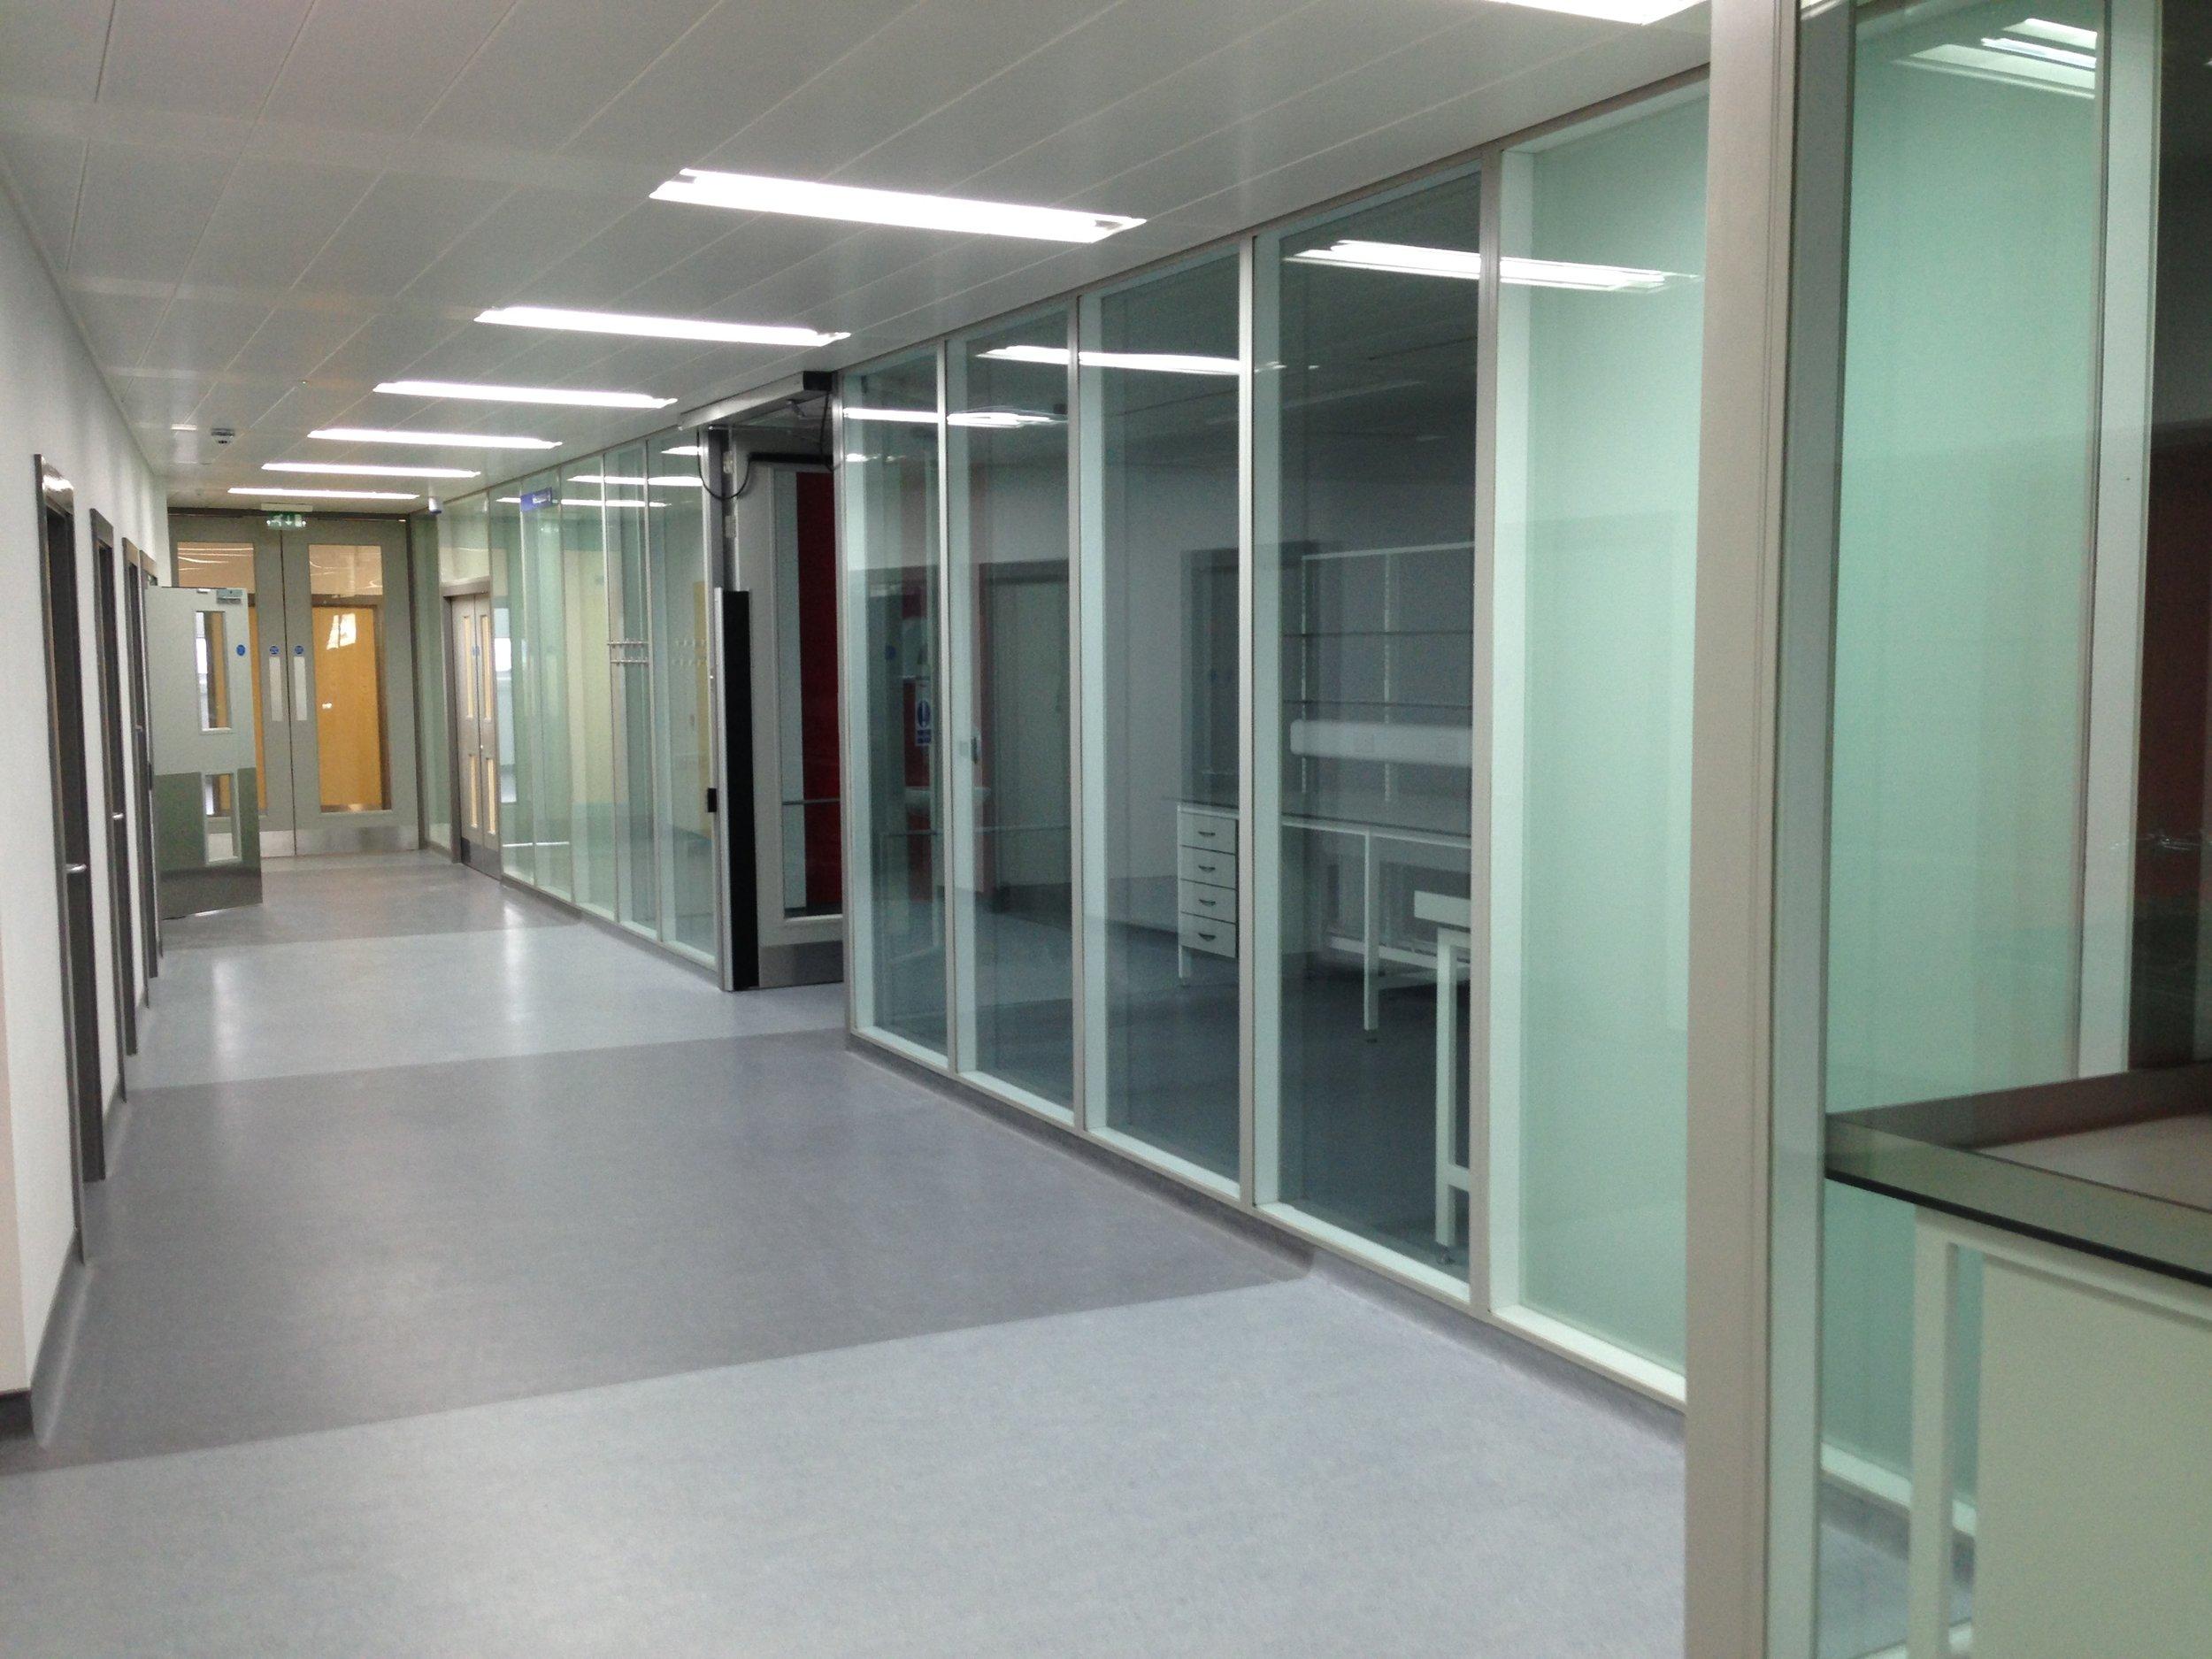 Glasgow Royal Infirmary case study -